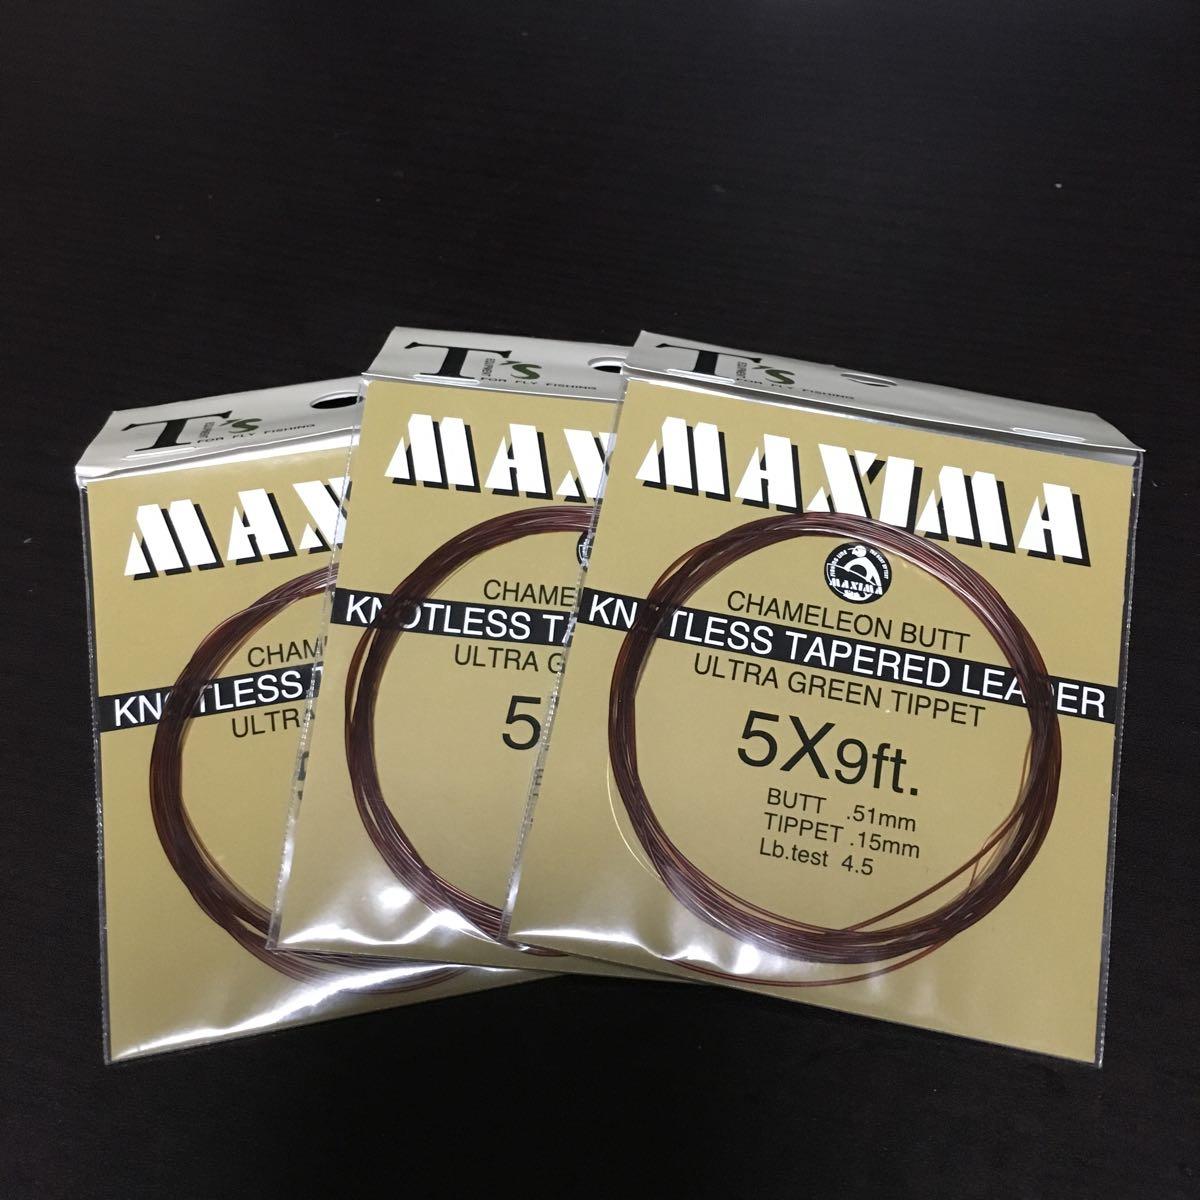 MAXIMA マキシマ リーダー 5x 9ft 3個セット フライ 品薄希少